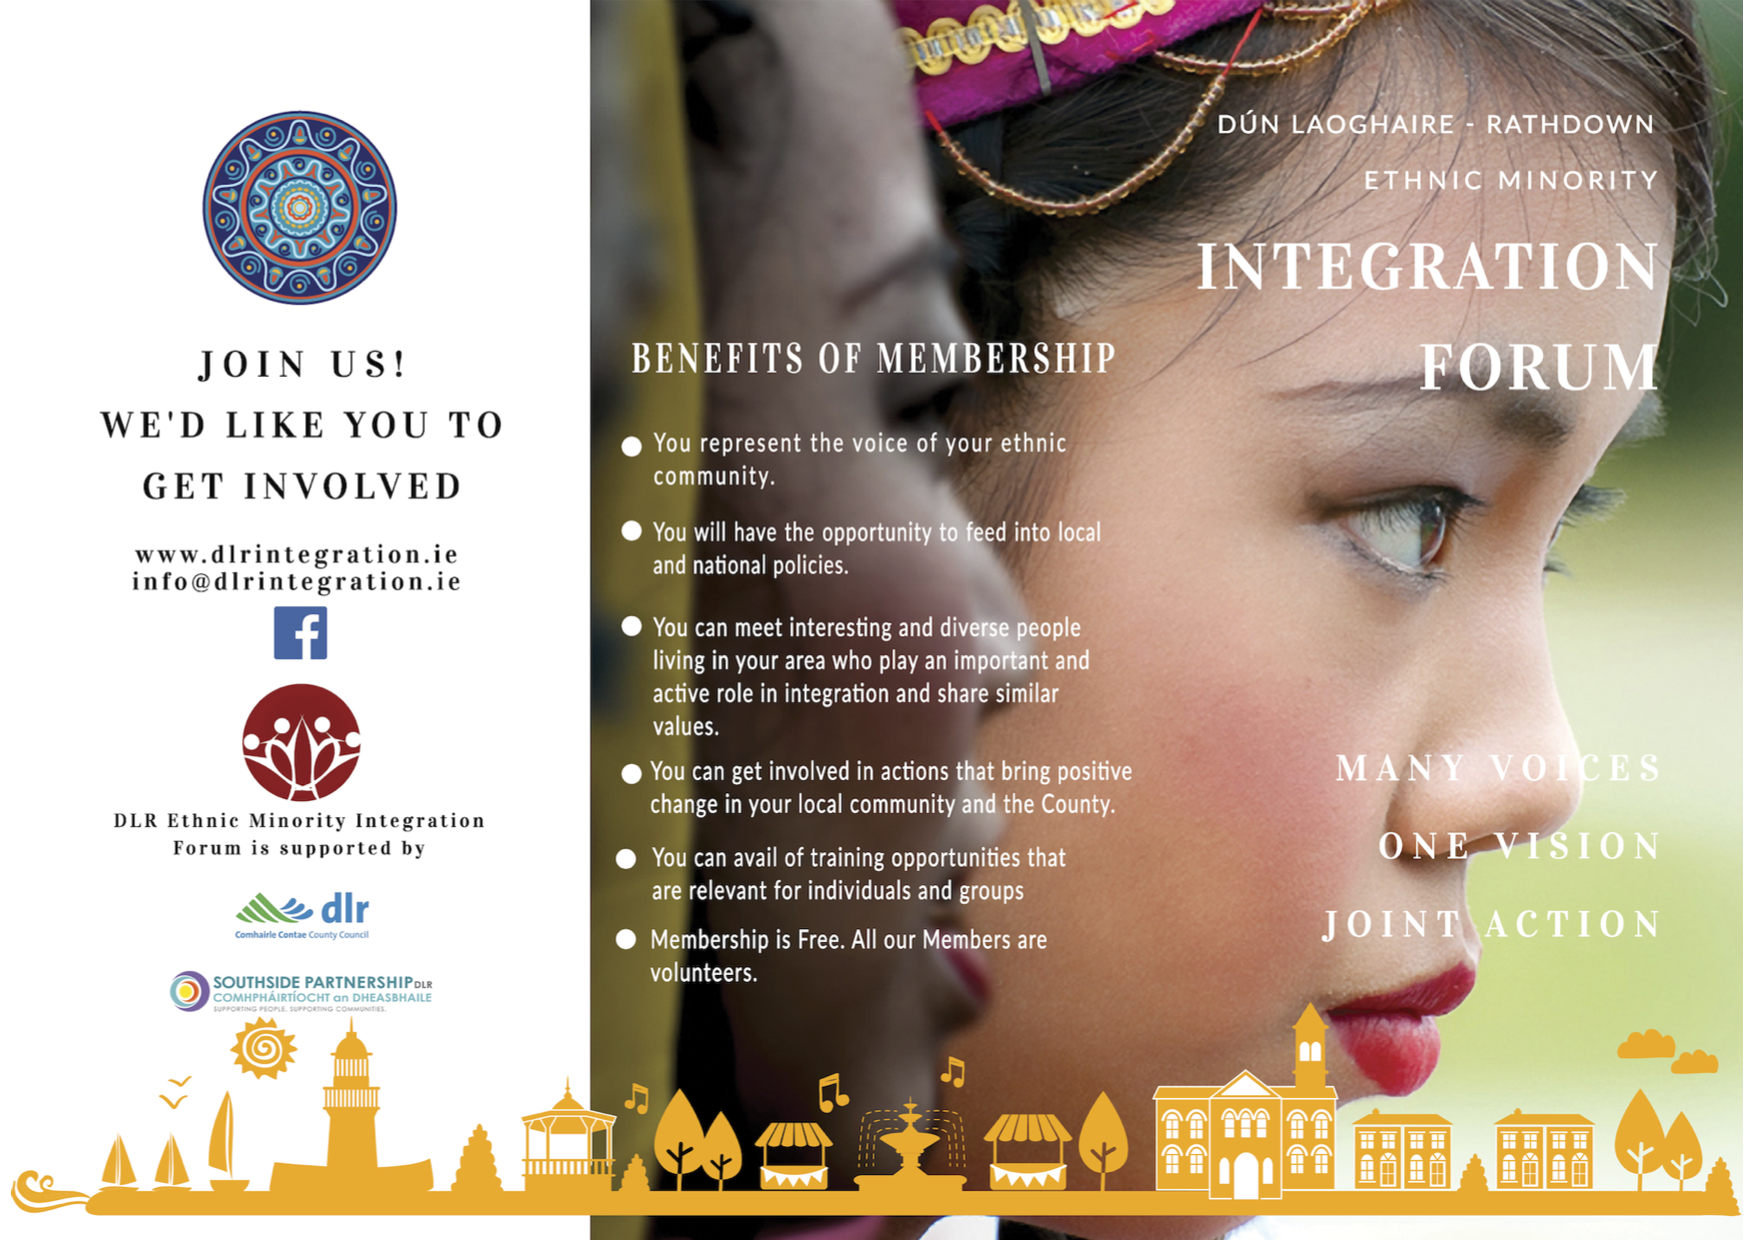 DLR Ethnic Minority Integration Forum